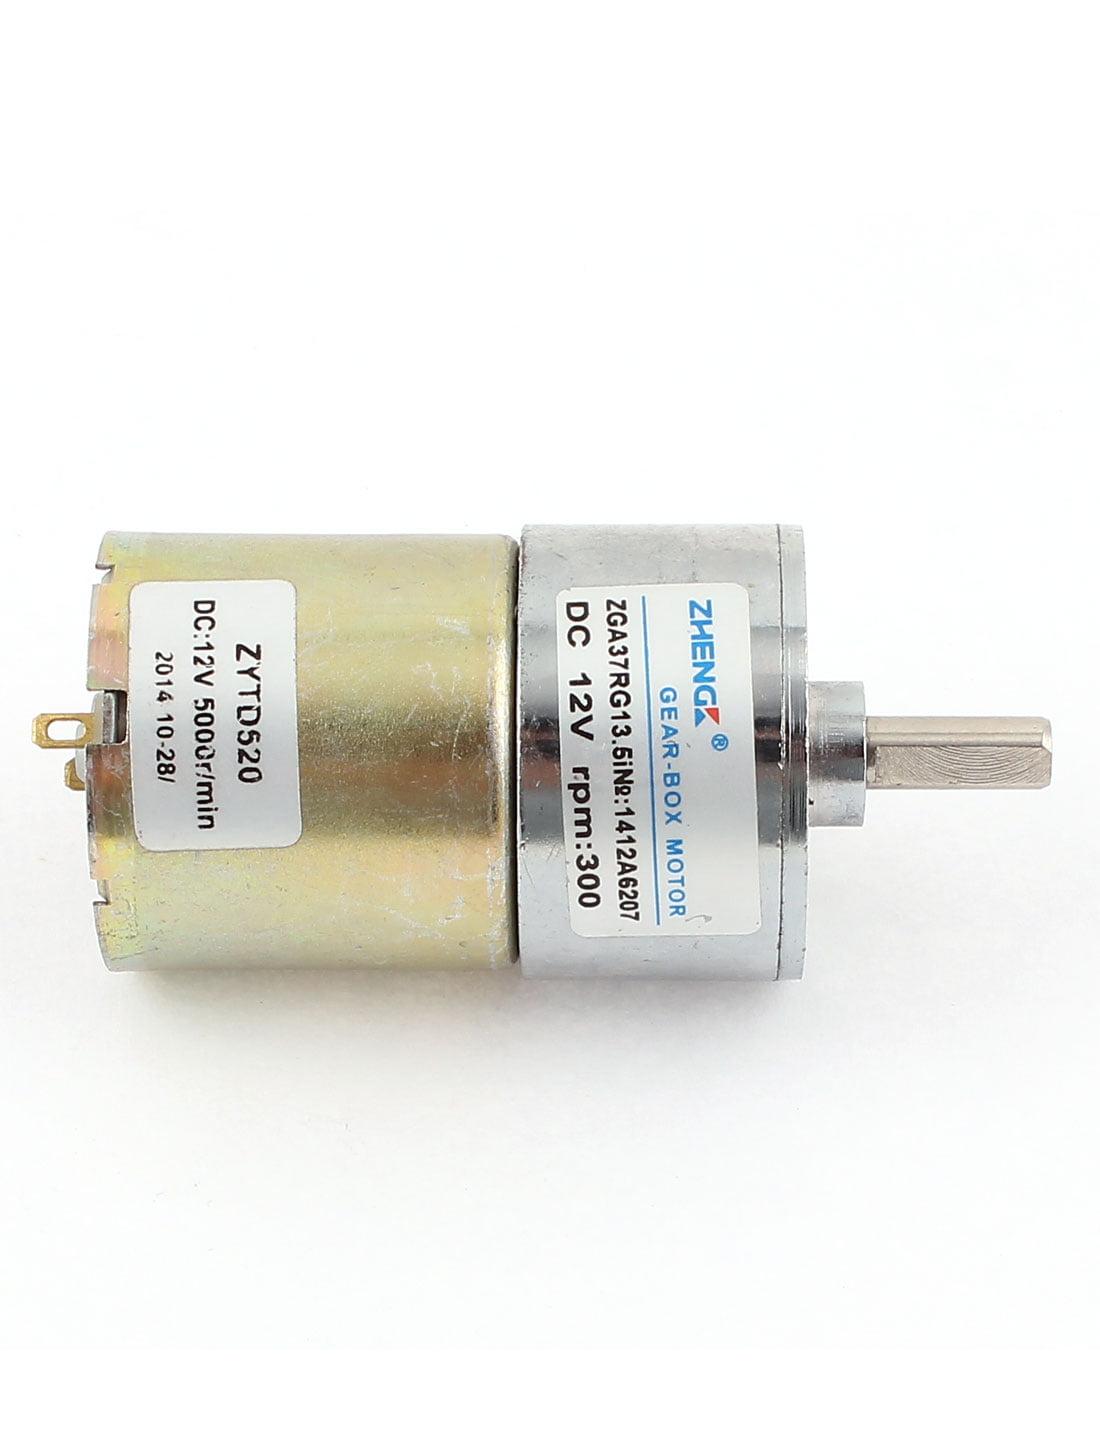 300 rpm 6 mm Shaft High Torque Gear-Box Electric Motor DC 12V